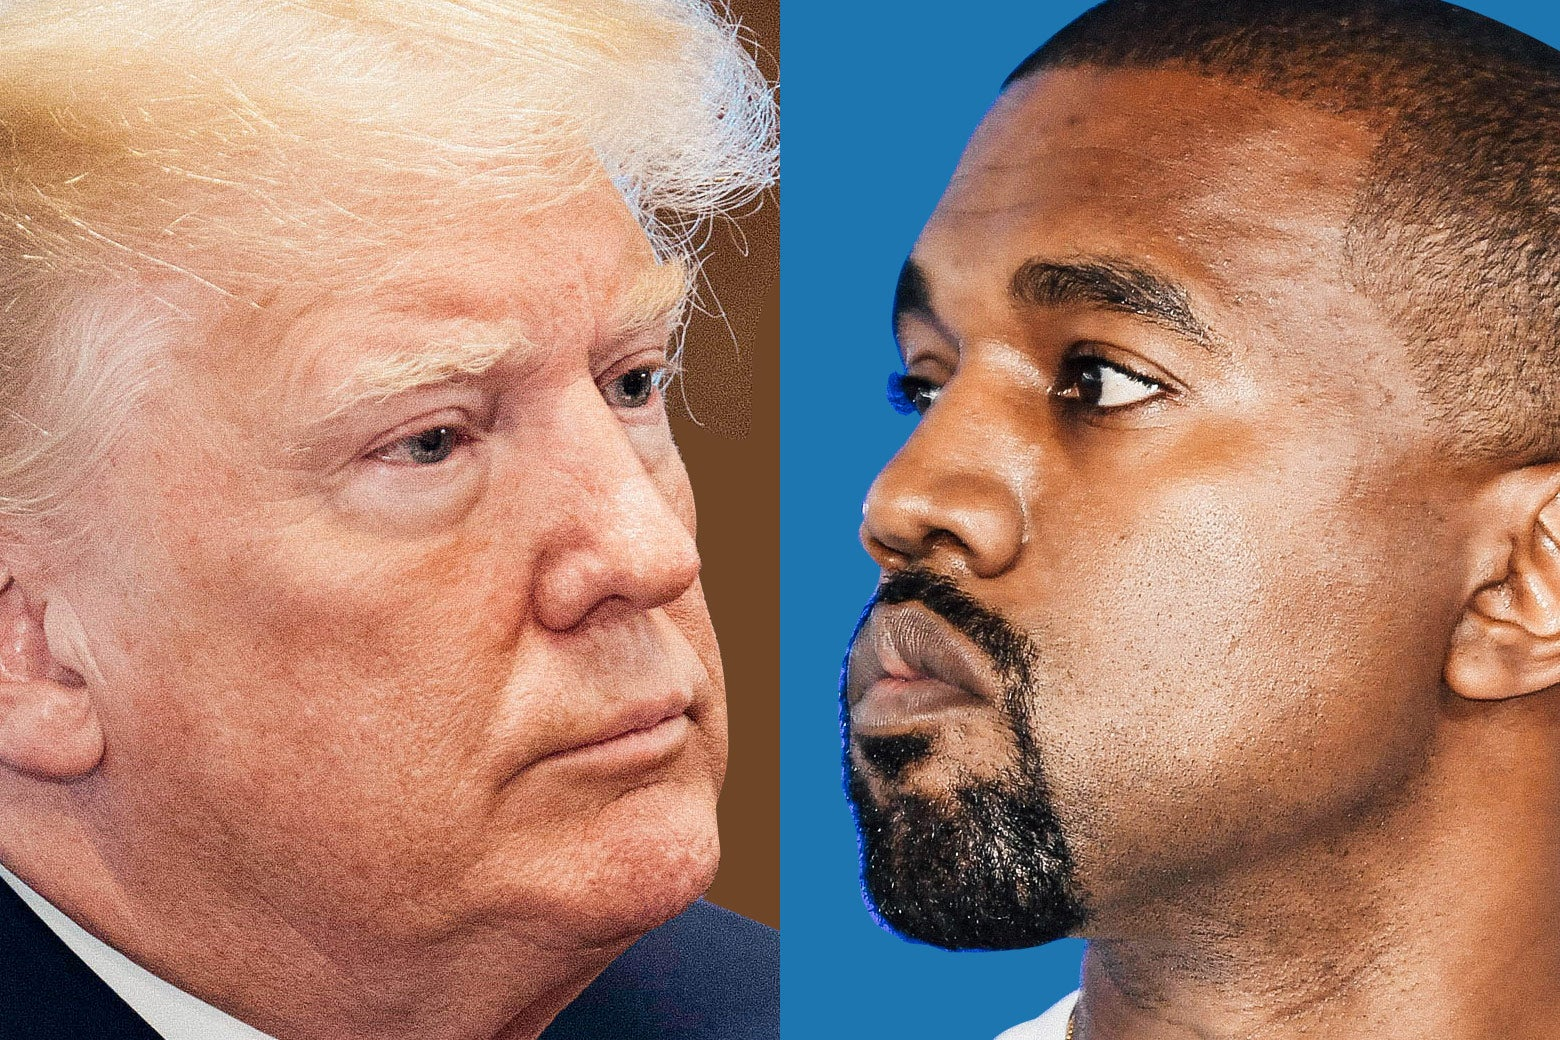 Trump and Kanye.